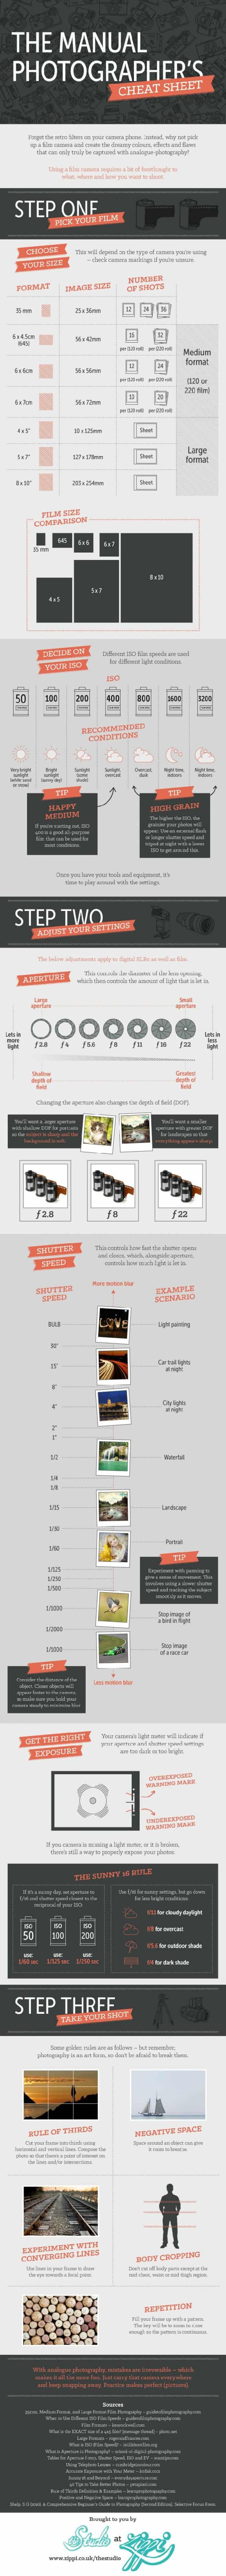 The basics of how to use a manual camera